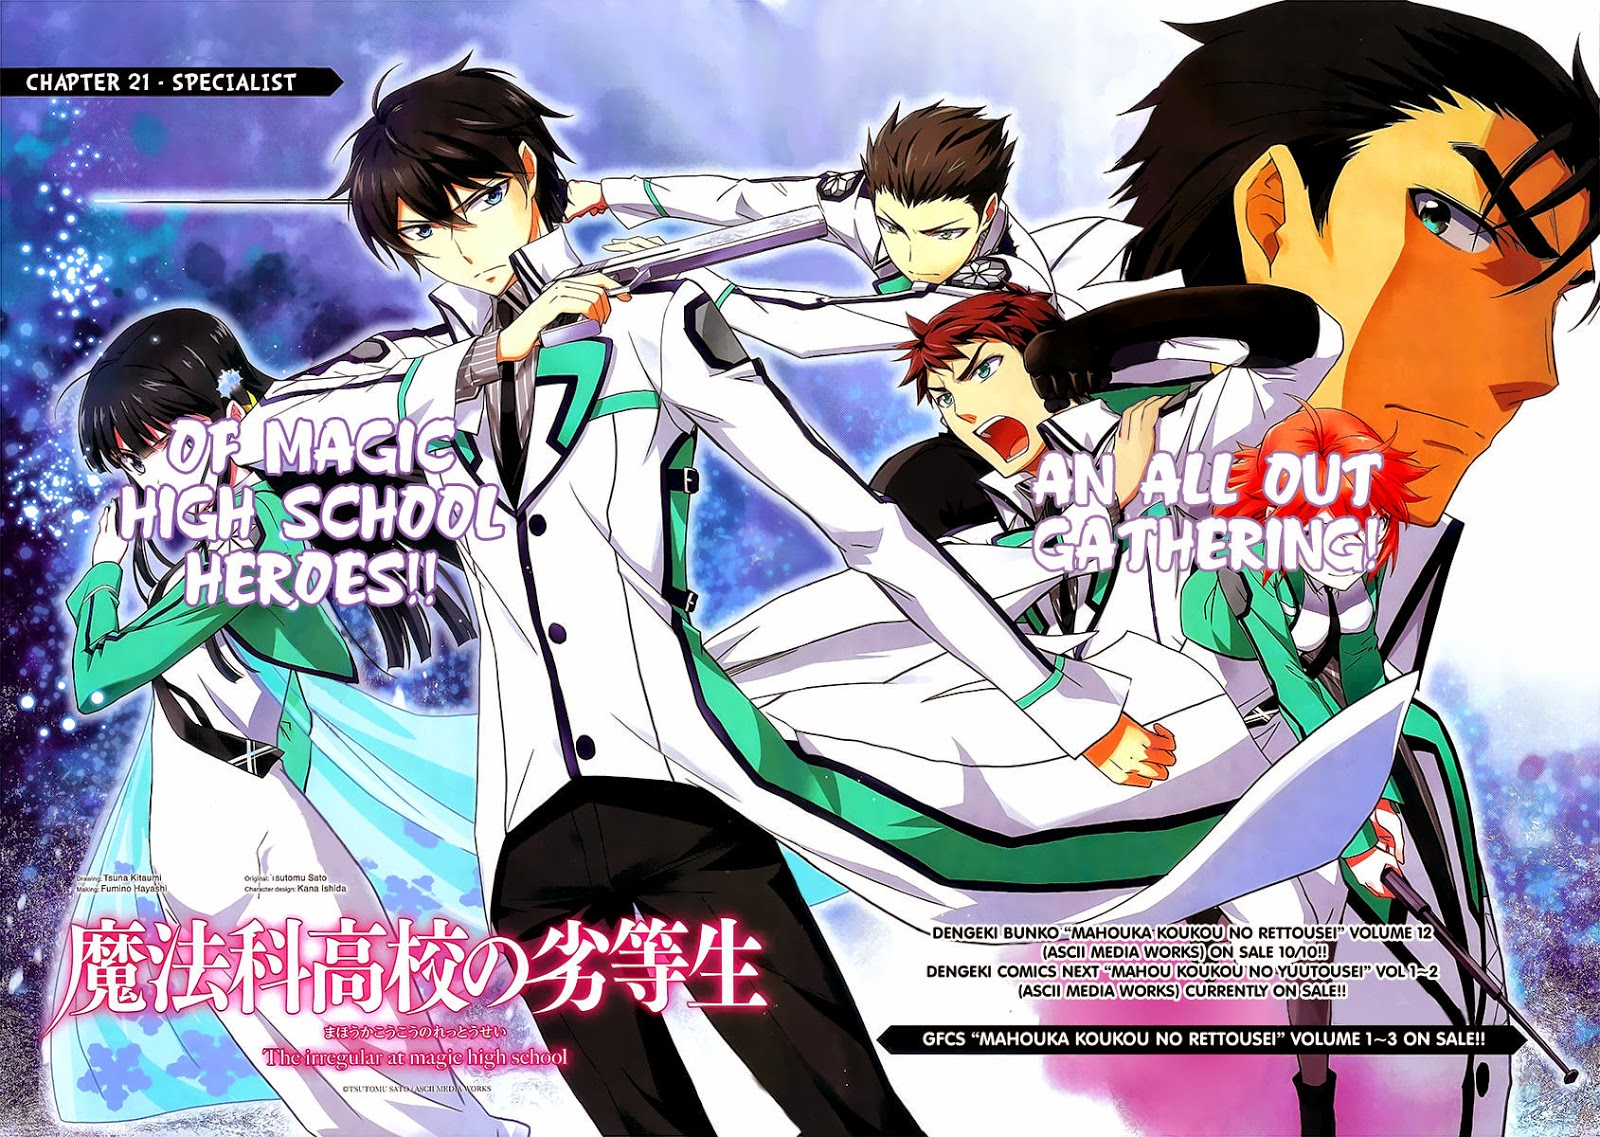 [ Info-Anime ] LISA Akan Merilis Lagu Pembuka Dari Anime The Irregular At Magic High School Pada Tanggal 7 Mei